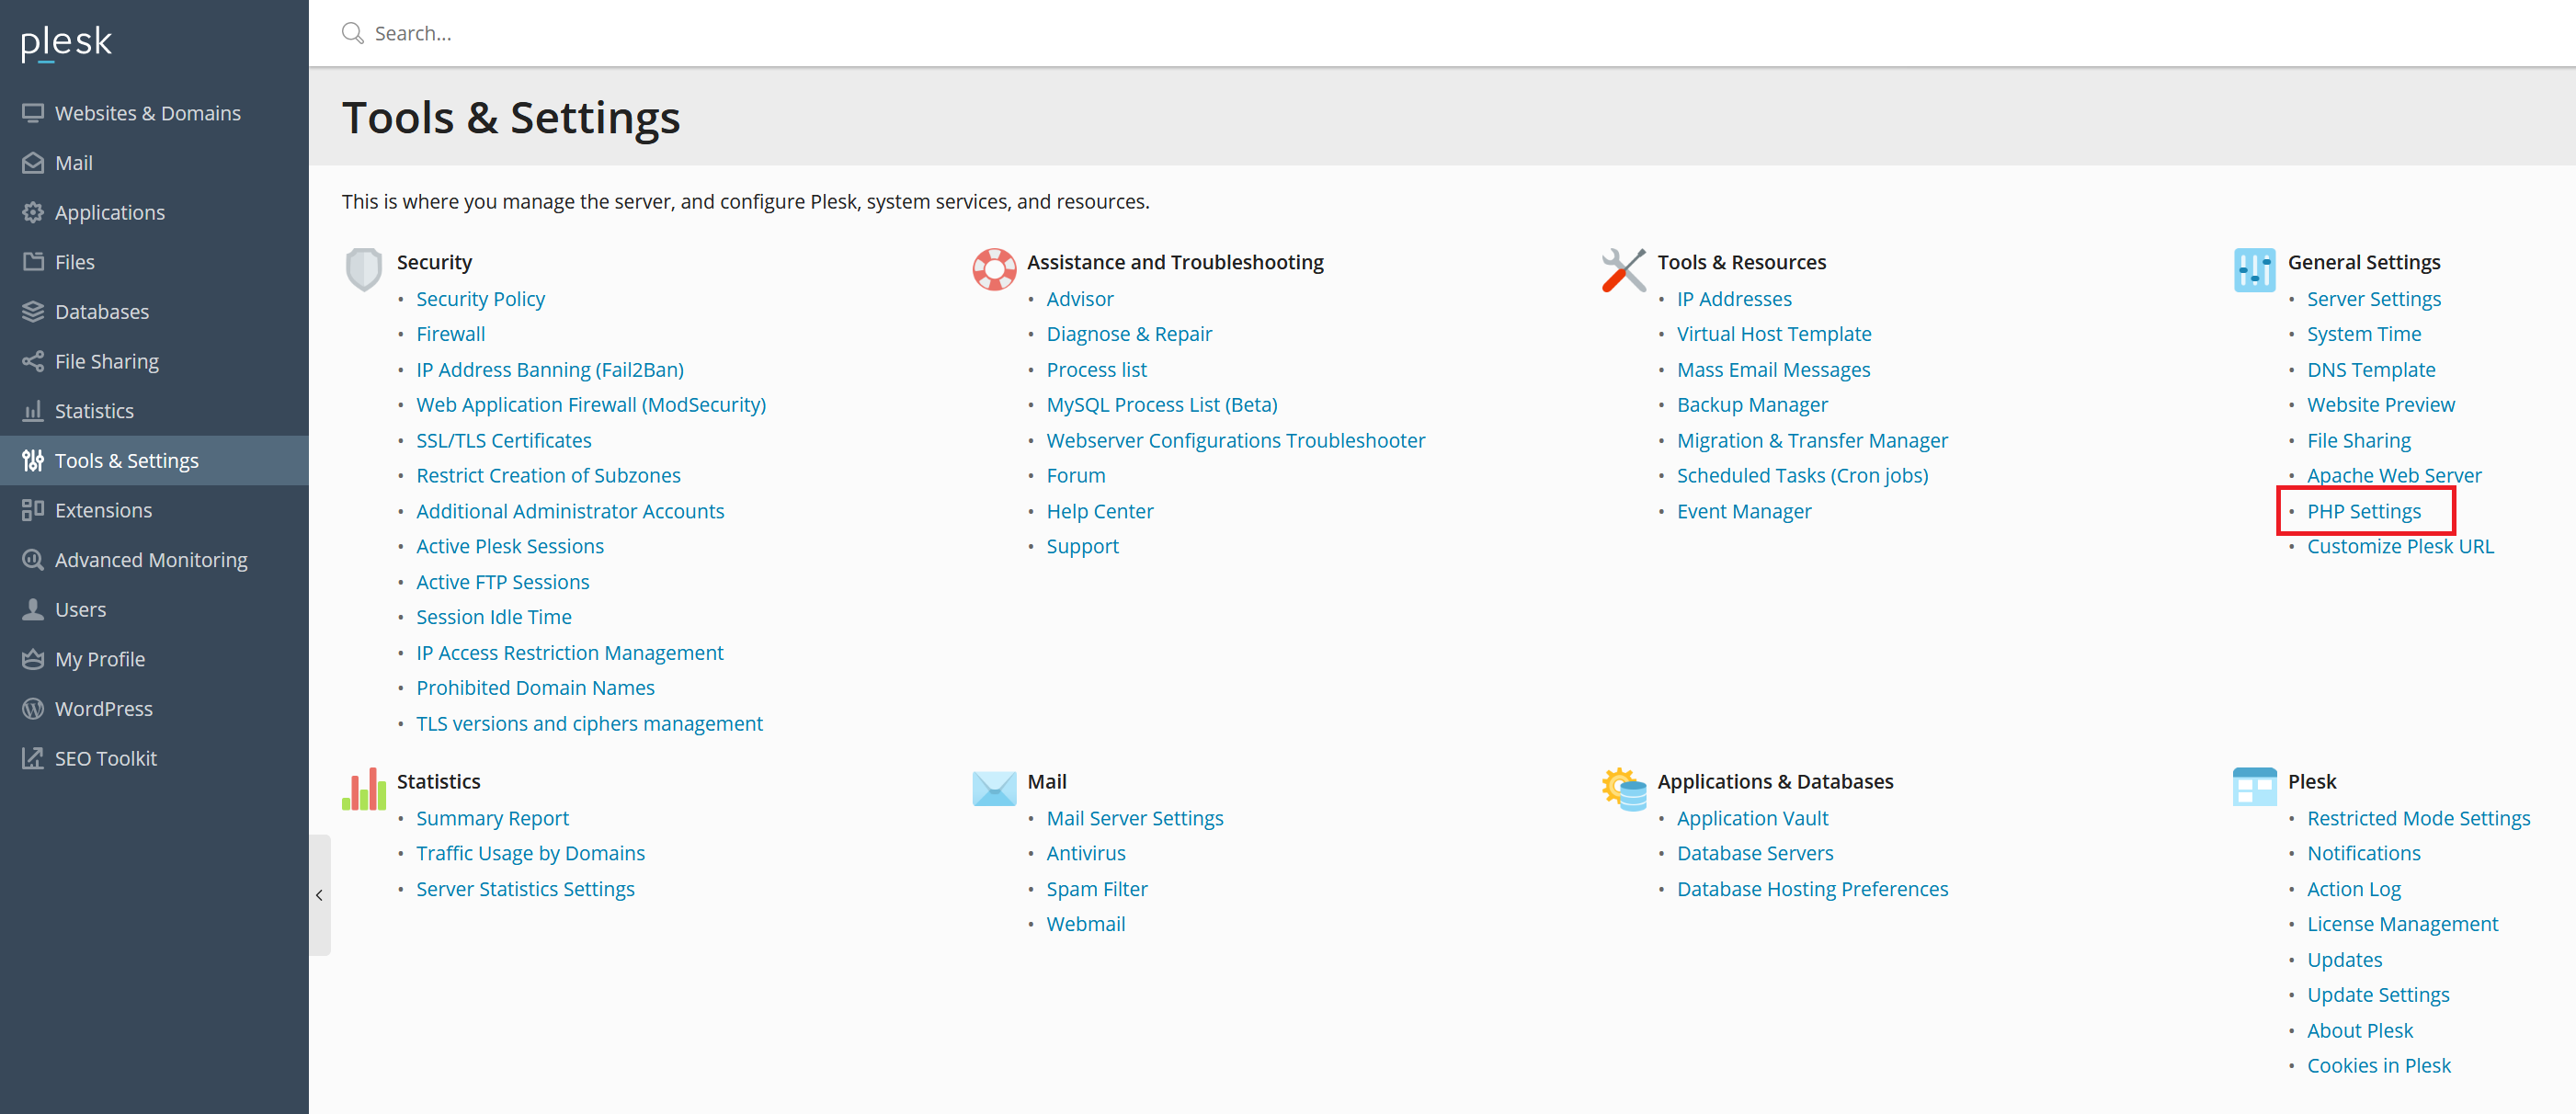 plesk tools and settings php settings